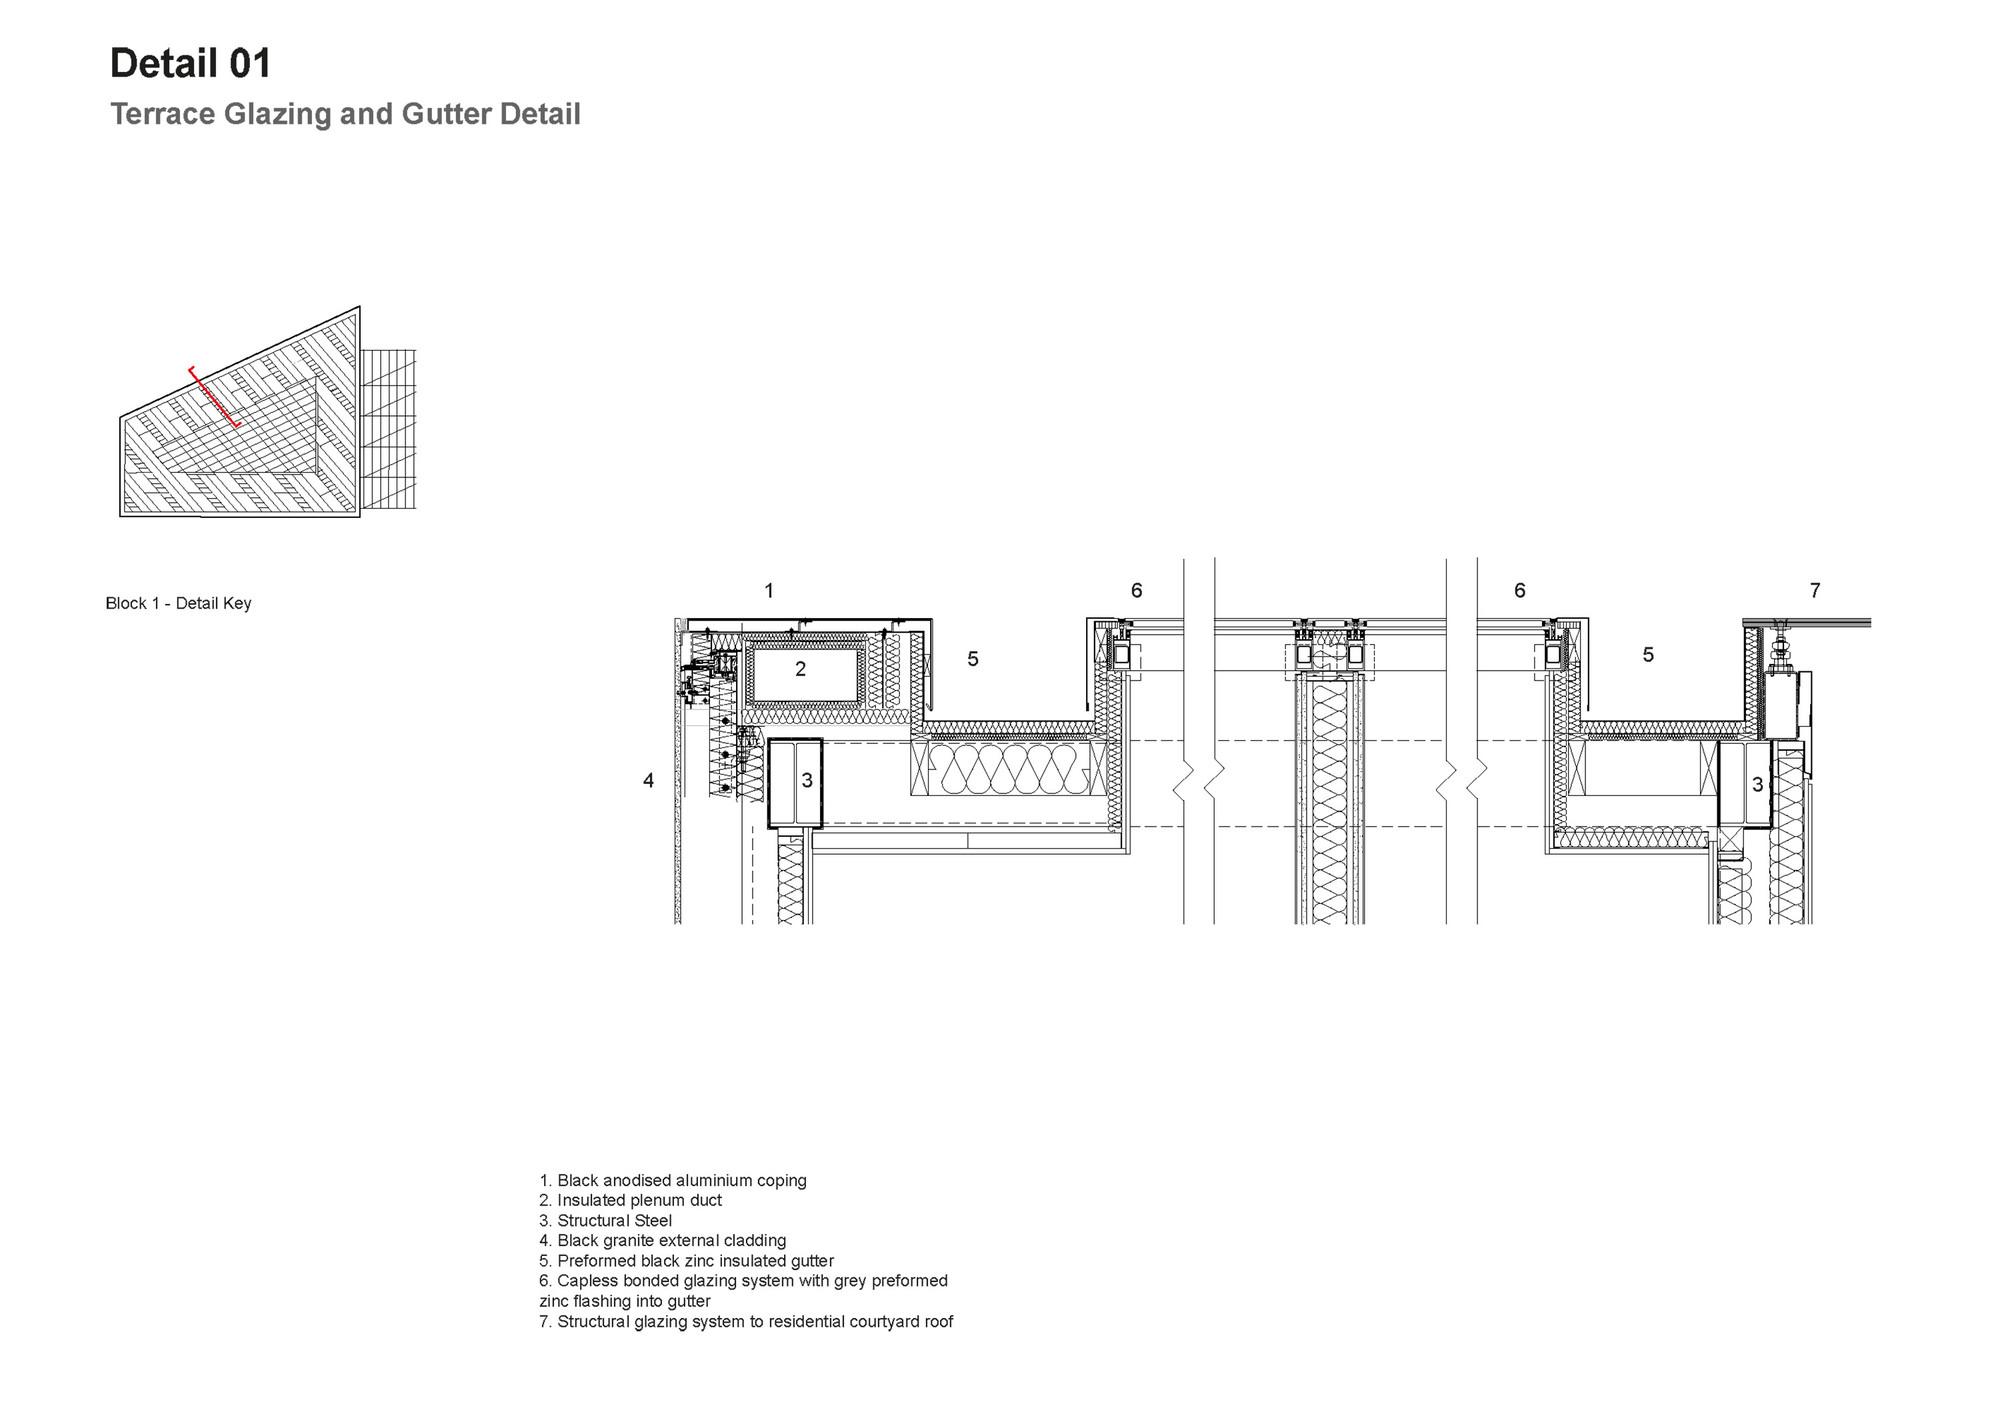 Galeria de residencial mann island broadway malyan 24 for Terrace khurra detail